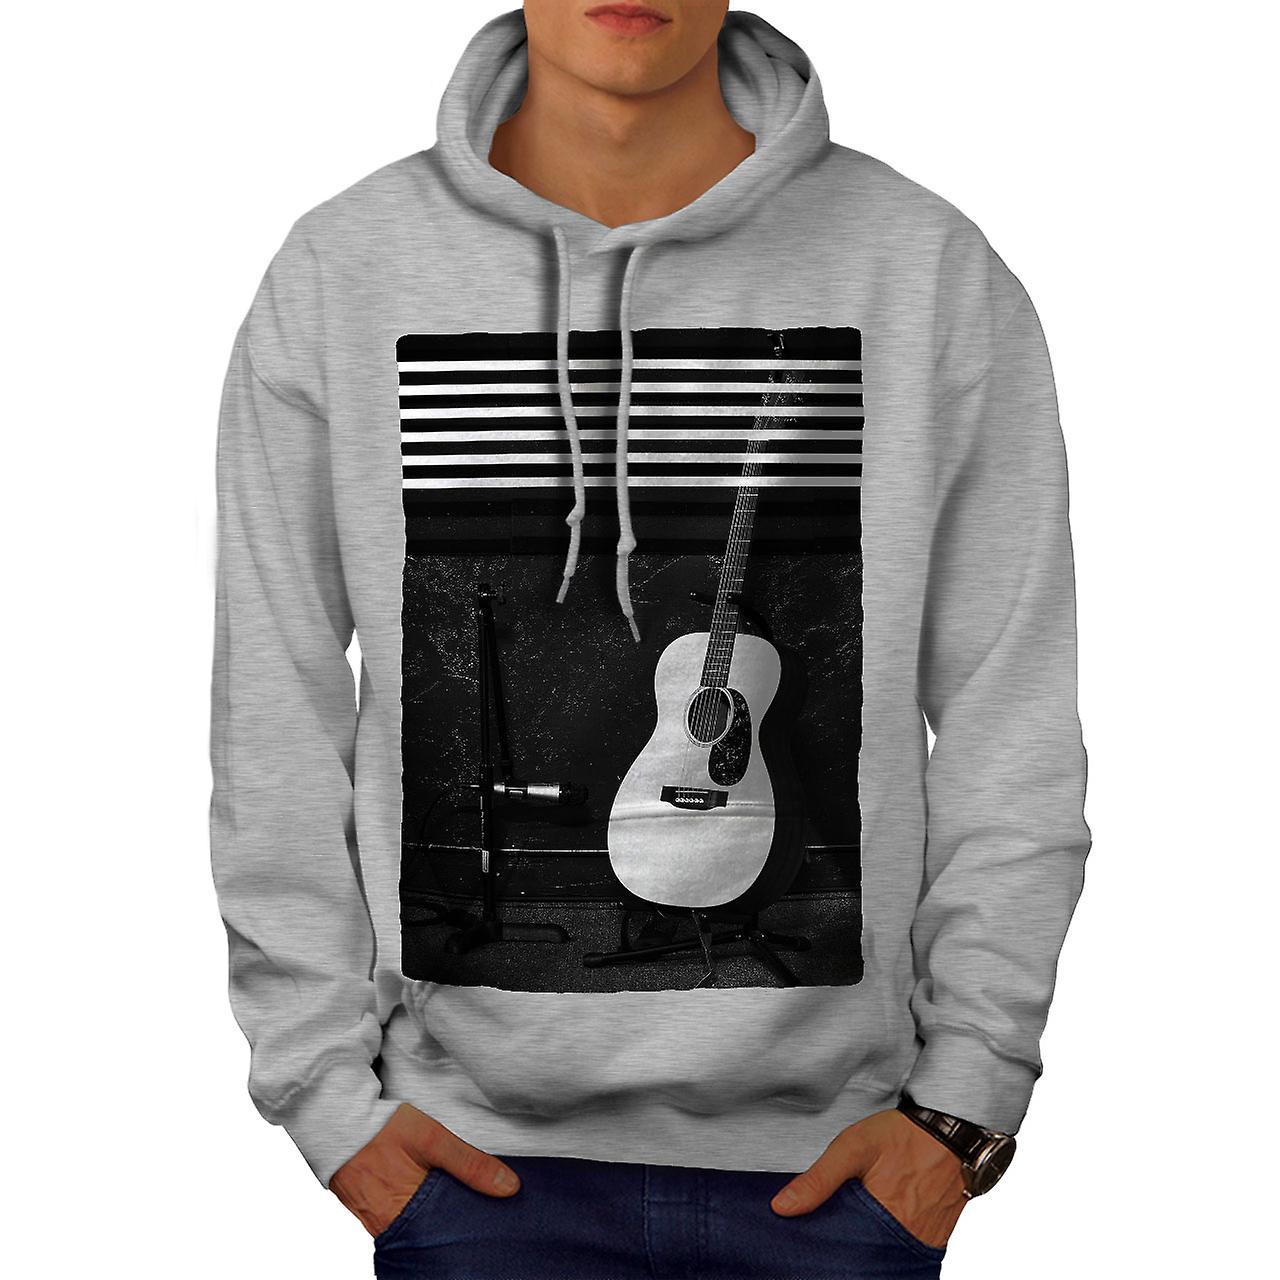 acoustic guitar men greyhoodie wellcoda fruugo. Black Bedroom Furniture Sets. Home Design Ideas